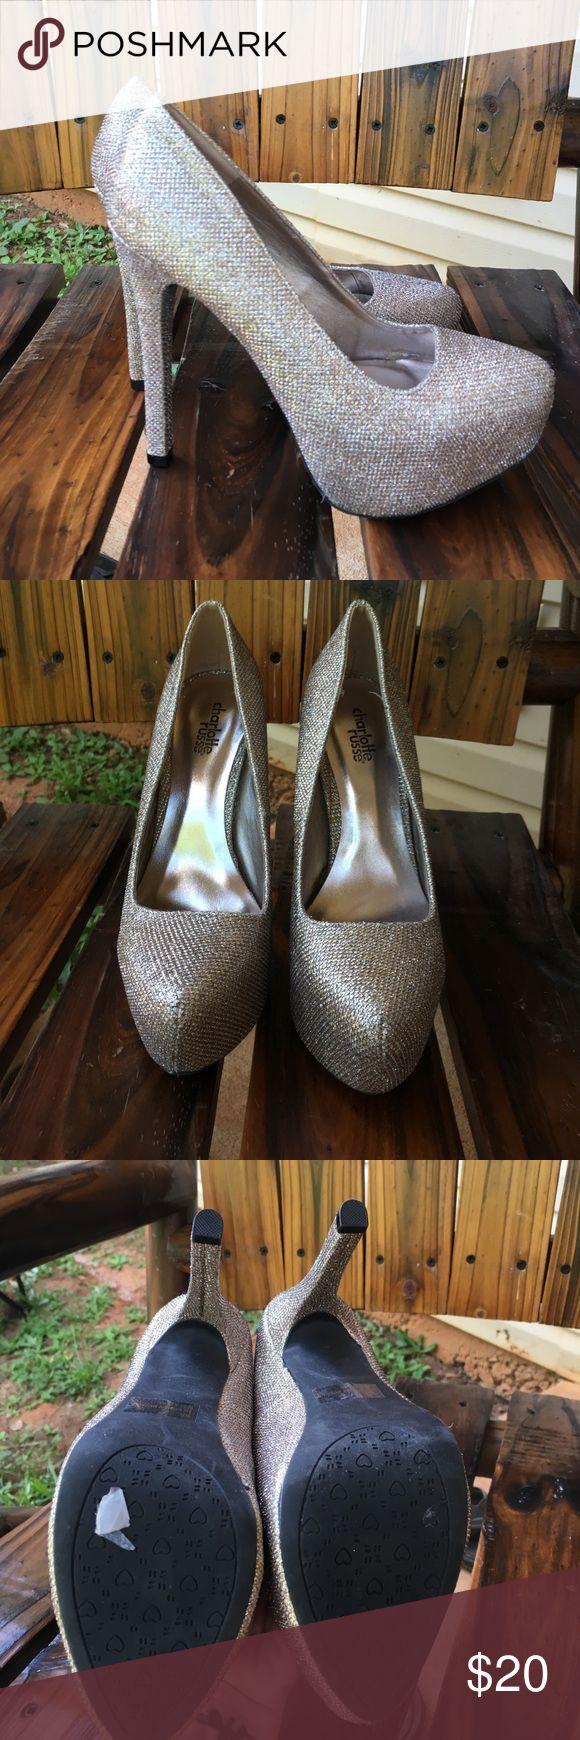 Gold glitter heels Beautiful gold glitter heels Charlotte Russe Shoes Heels